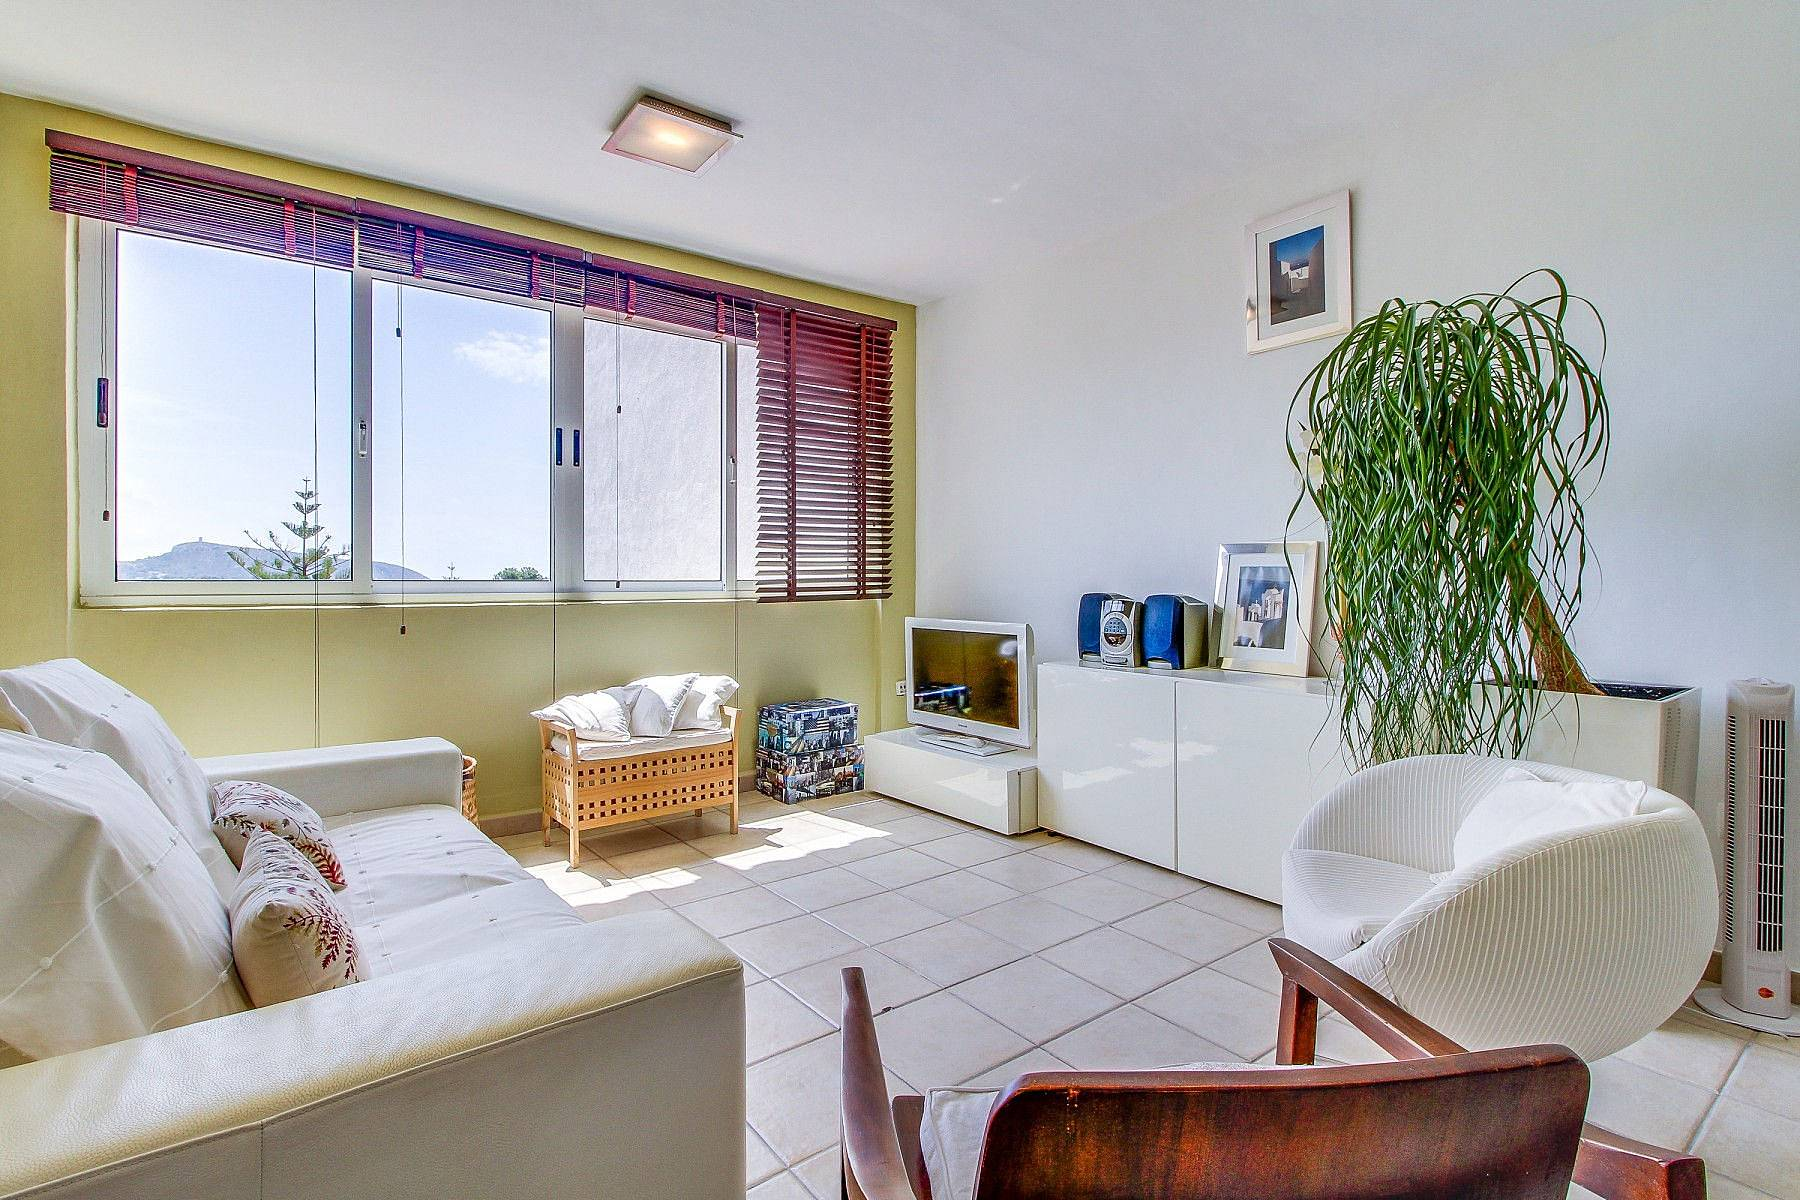 Apartamento en alquiler en j vea x bia tesoro de javea - Alquiler apartamentos en javea ...